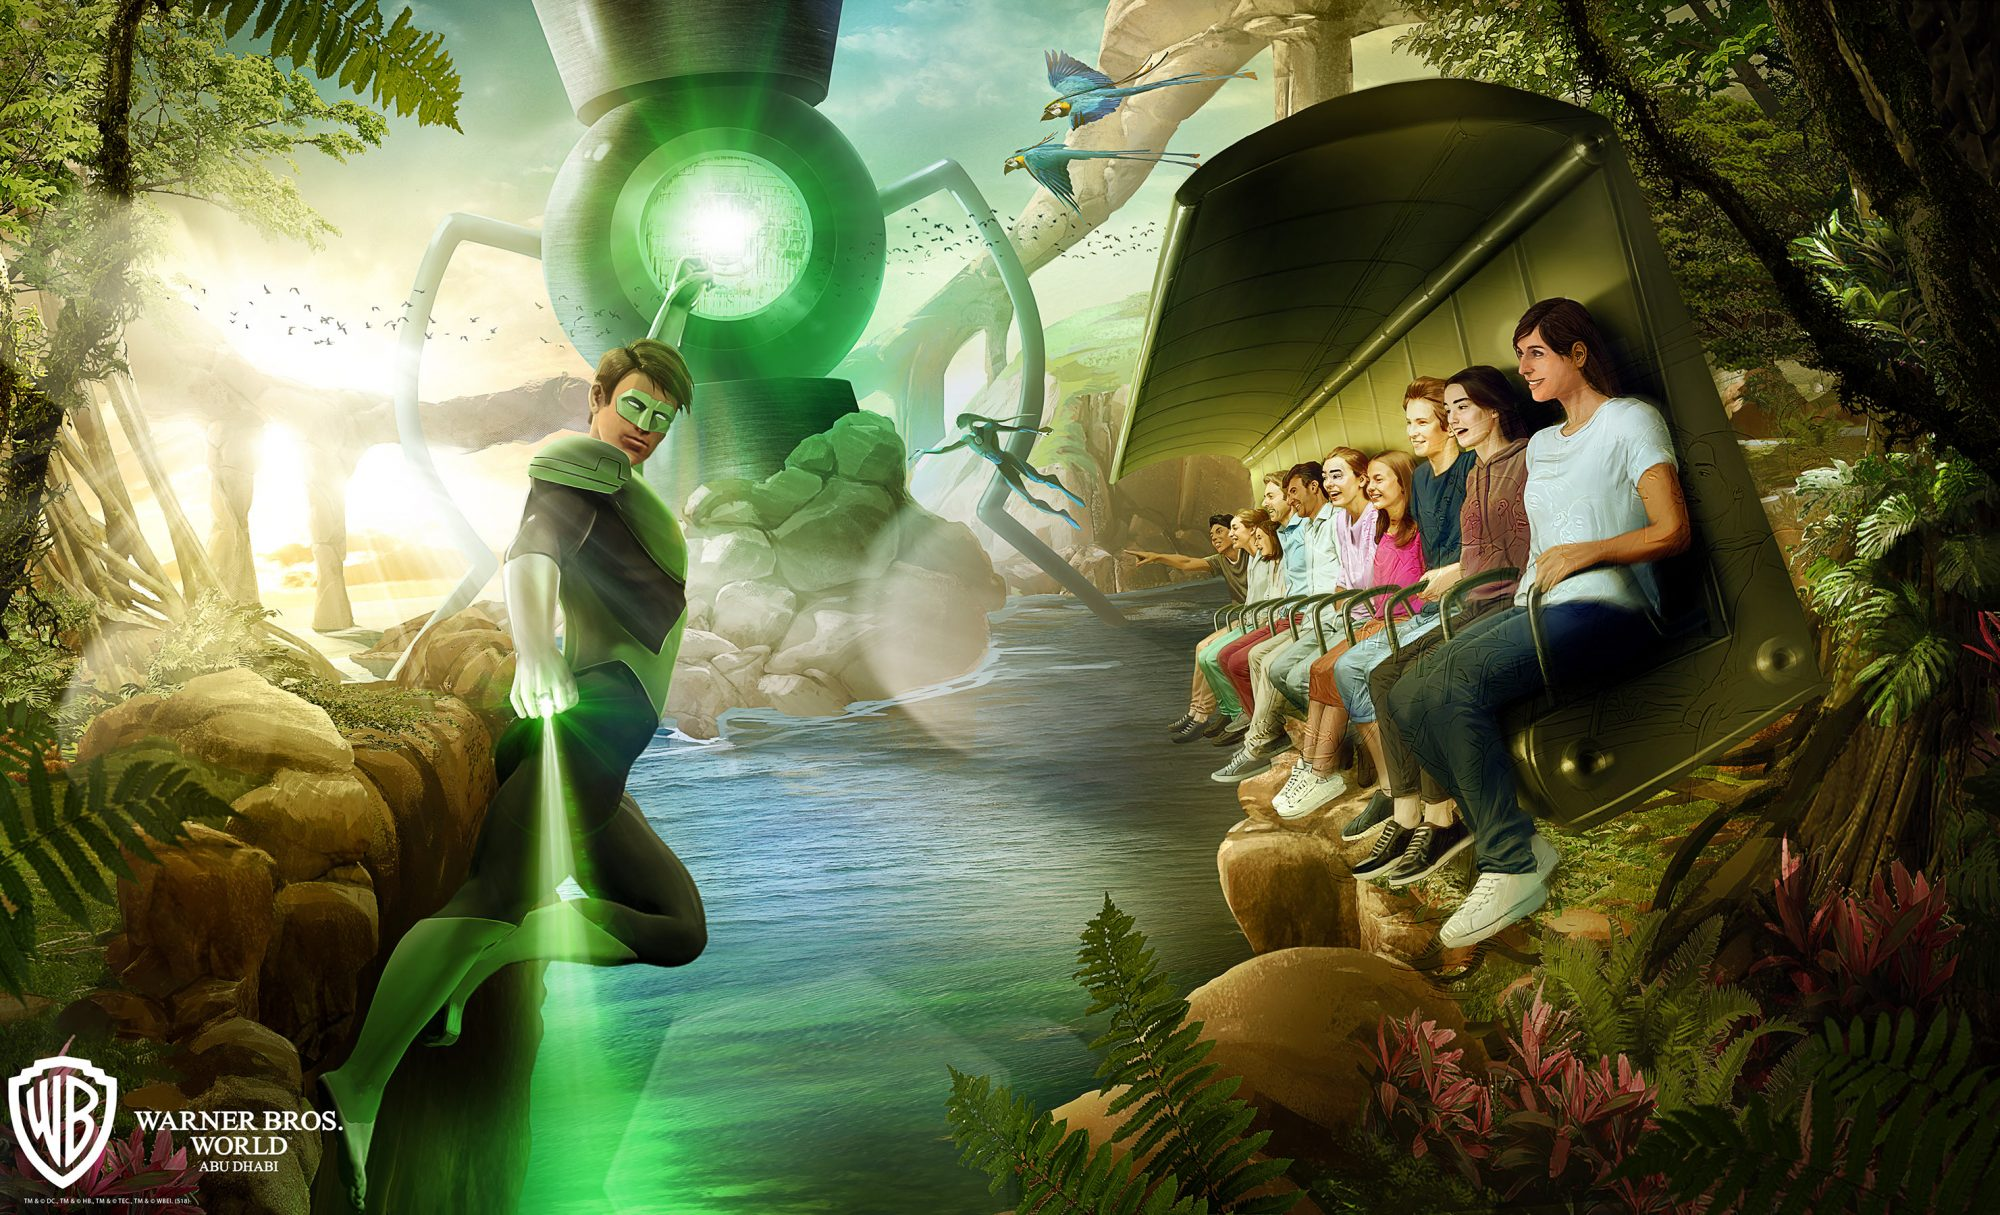 WBW-Green-Lantern-Galactic-Odyssey-Rendering